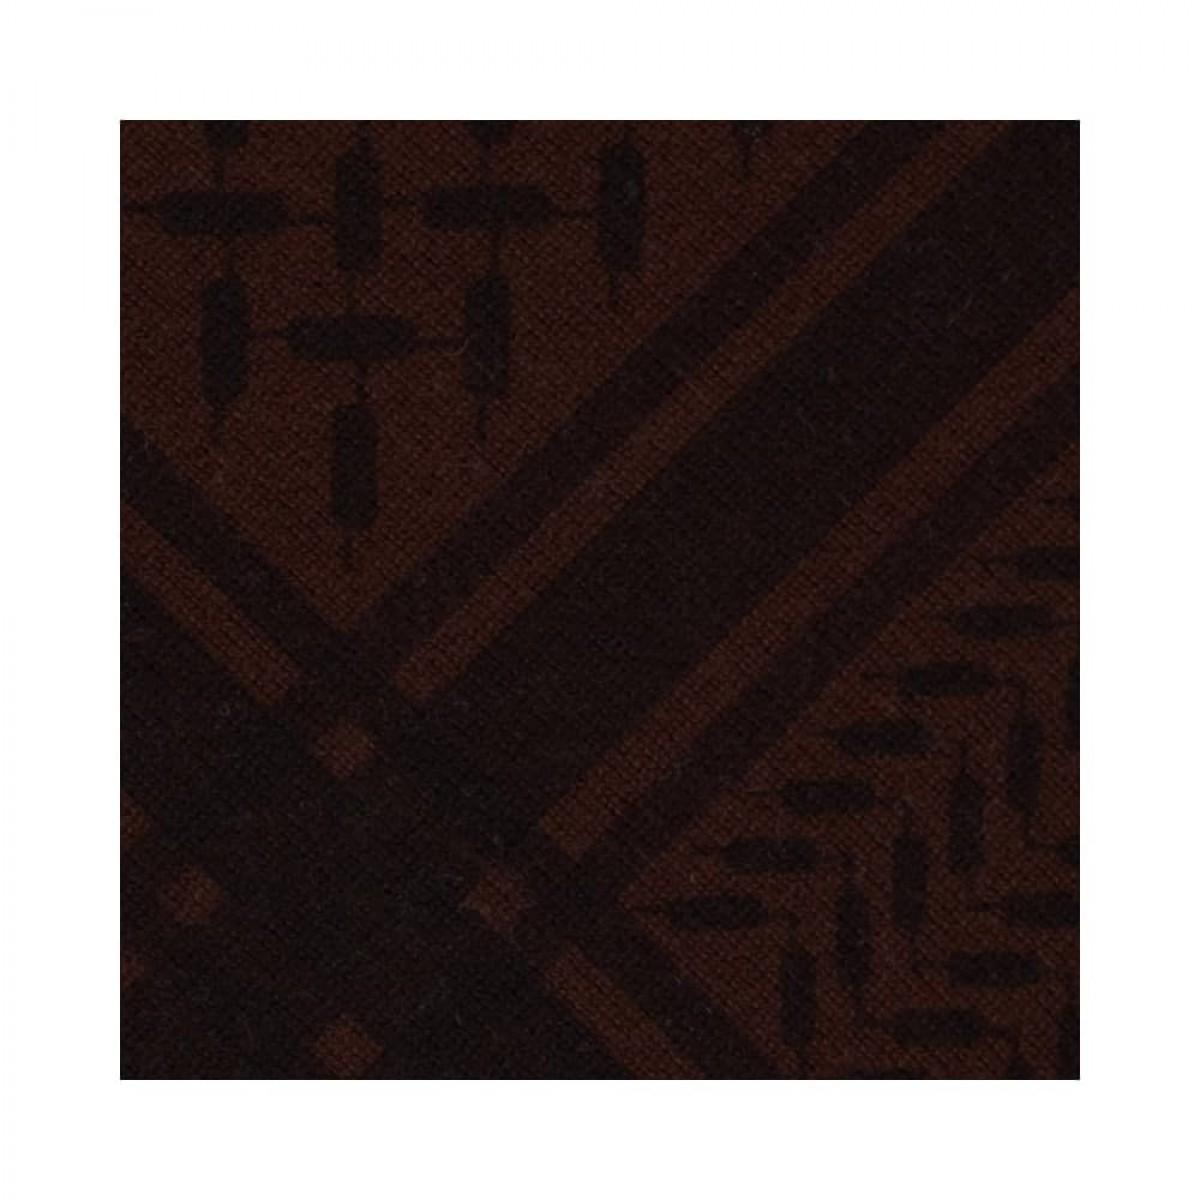 triangle trinity classic m - black on moka - print